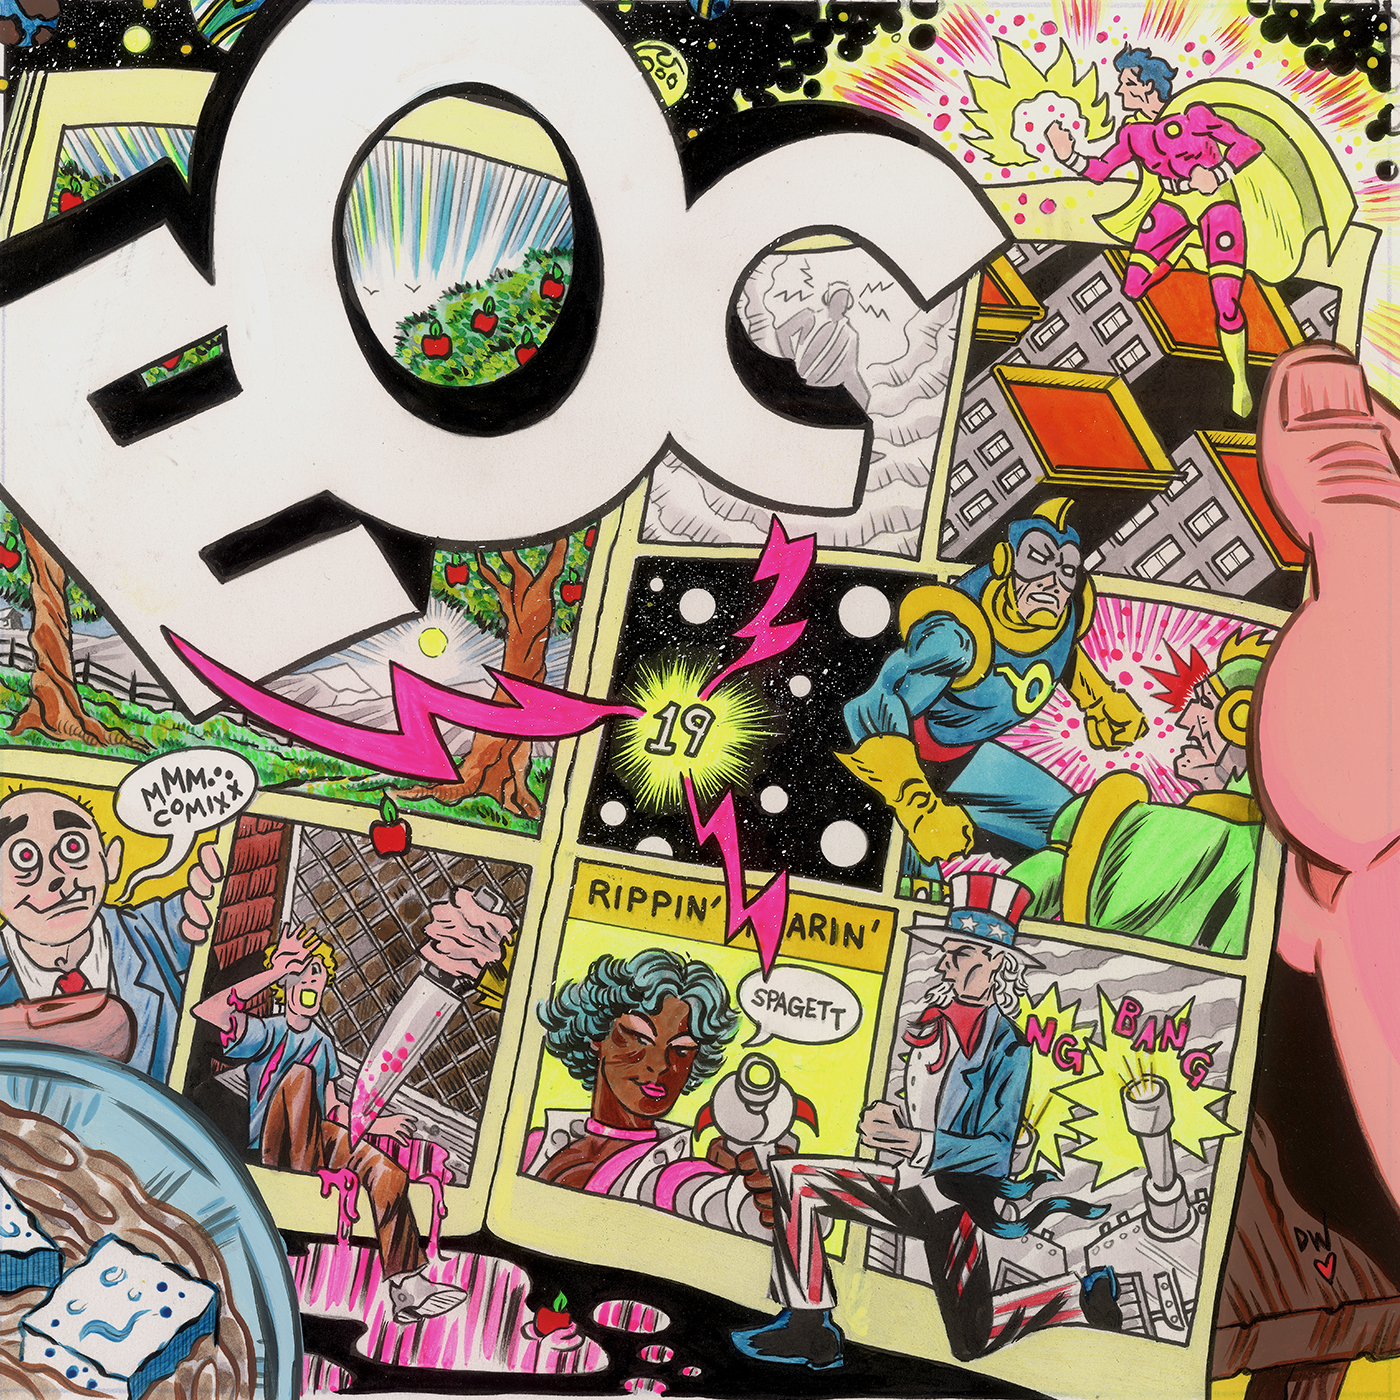 11 O Clock Comics Podcast by 11 O Clock Comics on Apple Podcasts 7e036e94b94